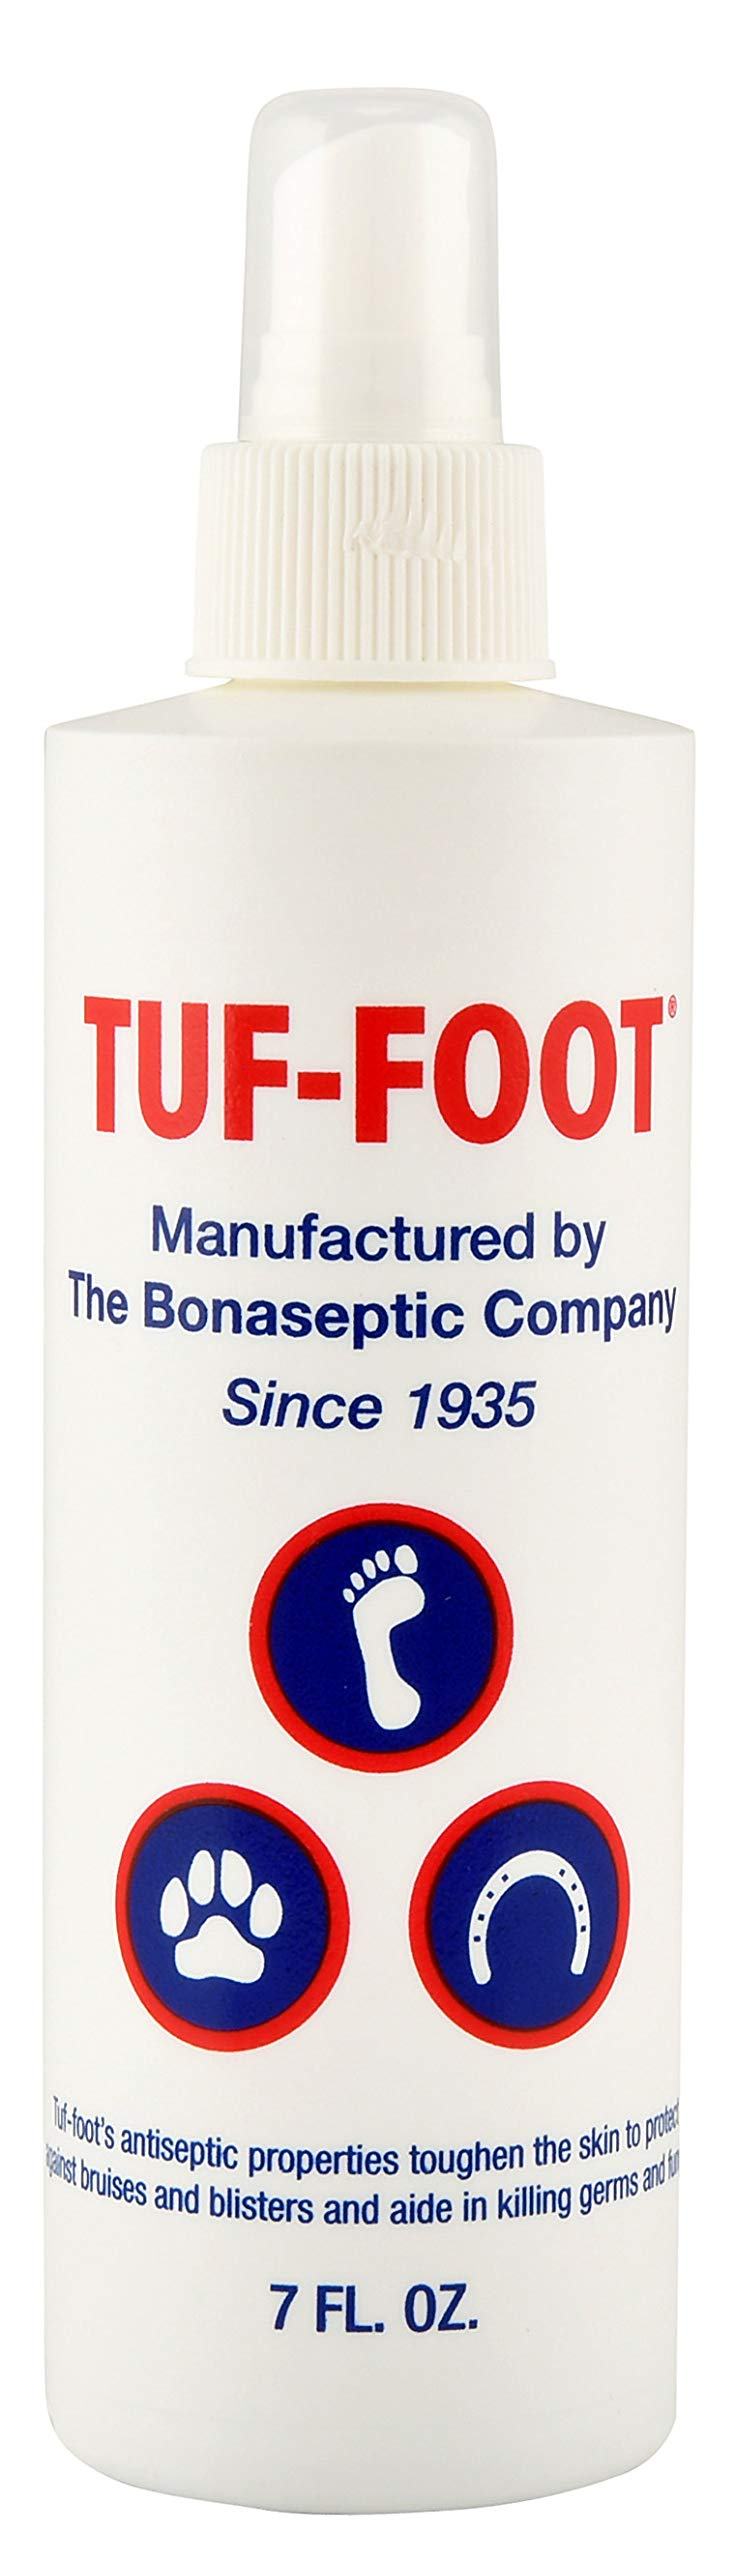 TUF-FOOT Liquid Foot, Hoof and Paw Protection - 7 oz